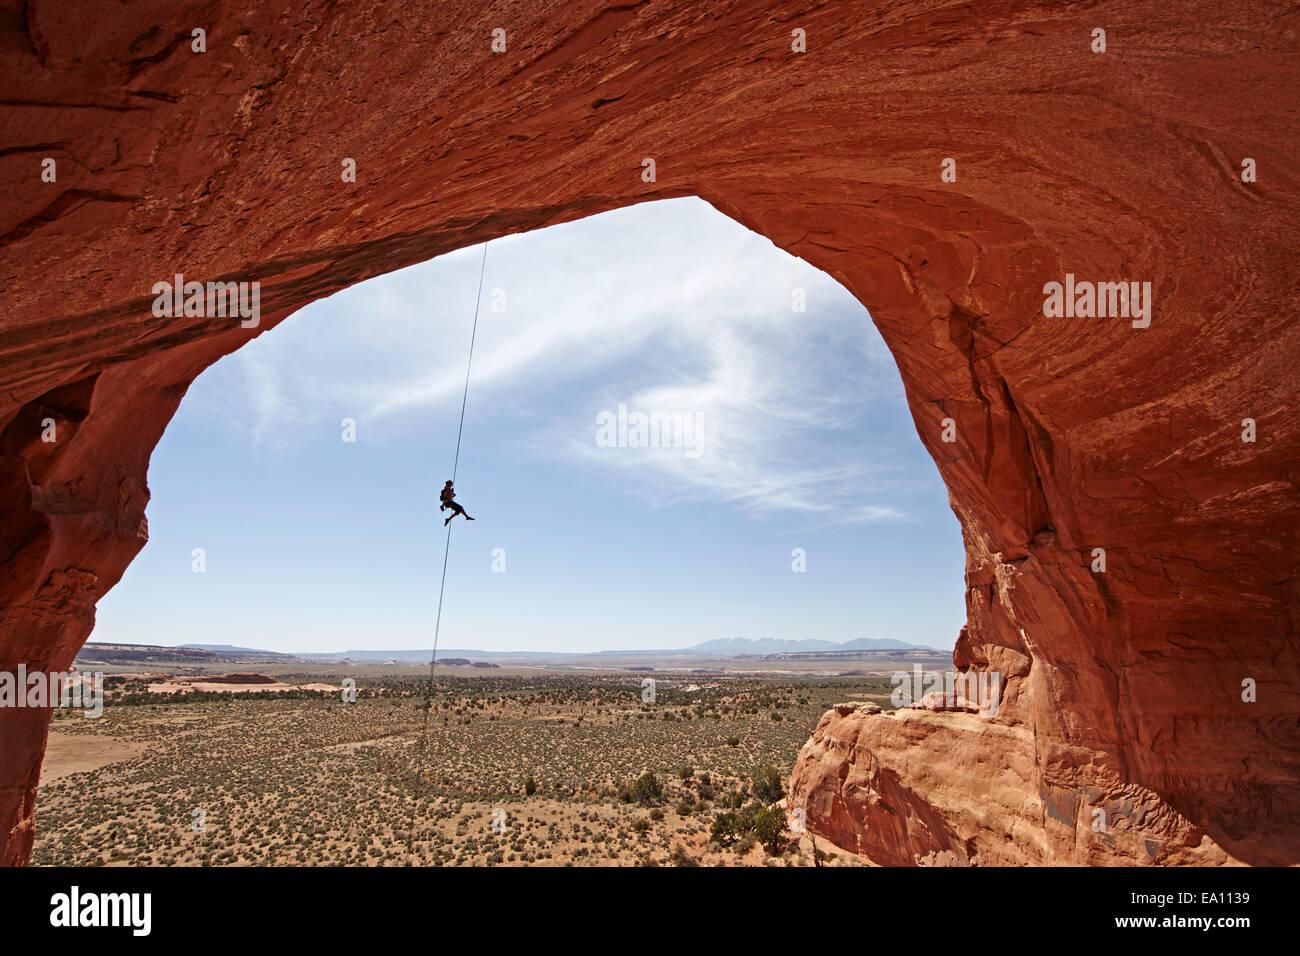 Mujer rappel desde arch, Moab, Utah, EE.UU. Imagen De Stock